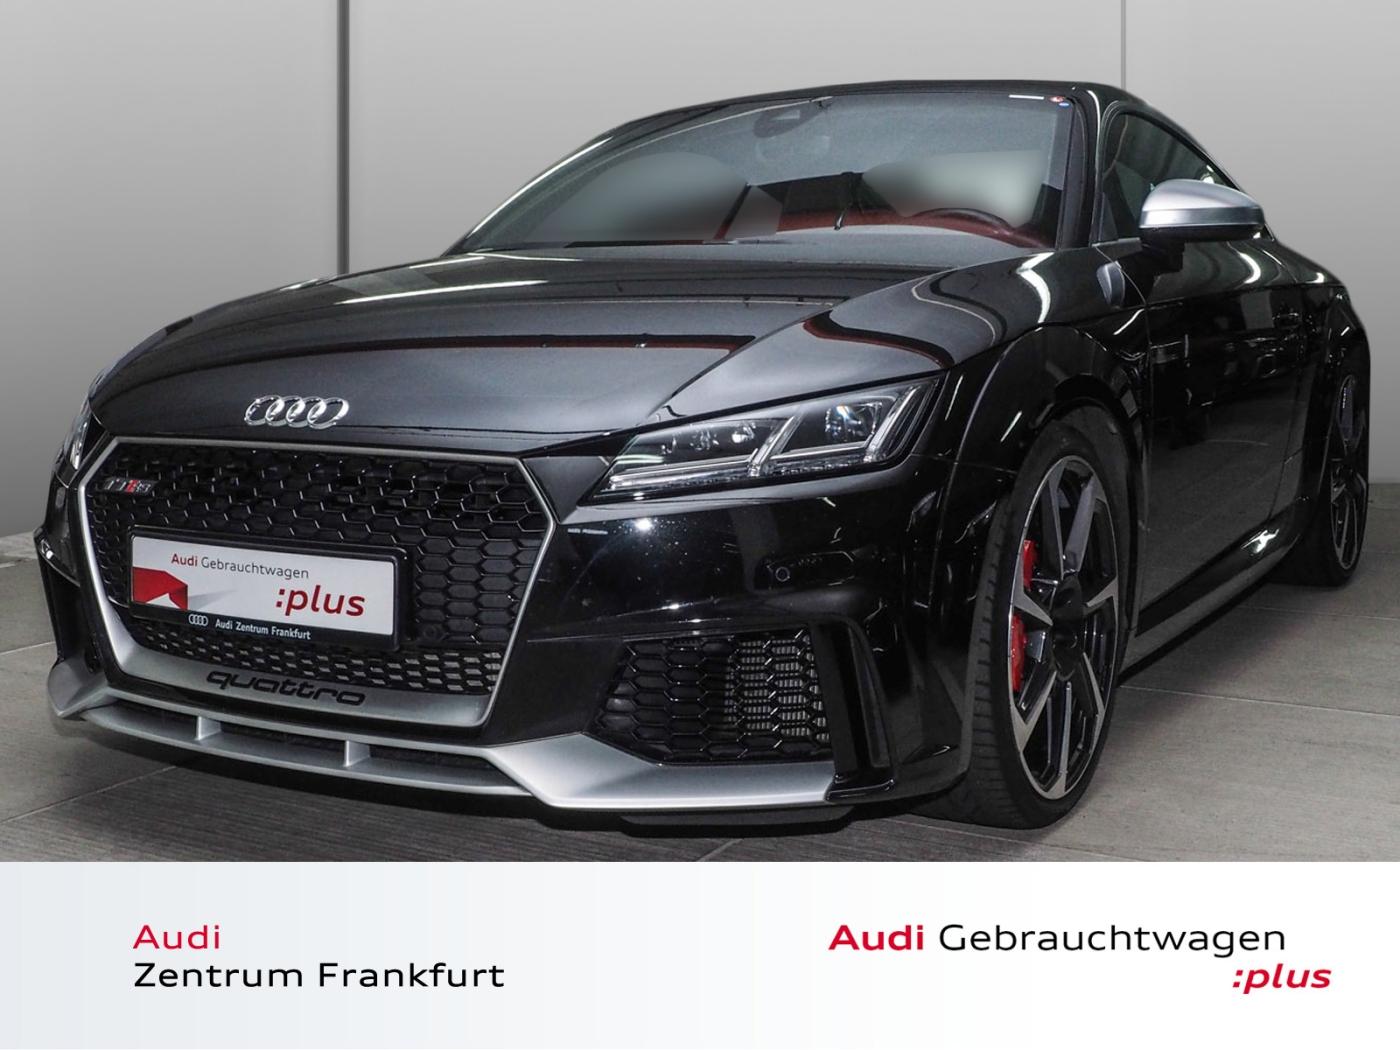 Audi TT RS Coupé 2.5 TFSI quattro S tronic Navi B&O M, Jahr 2018, Benzin